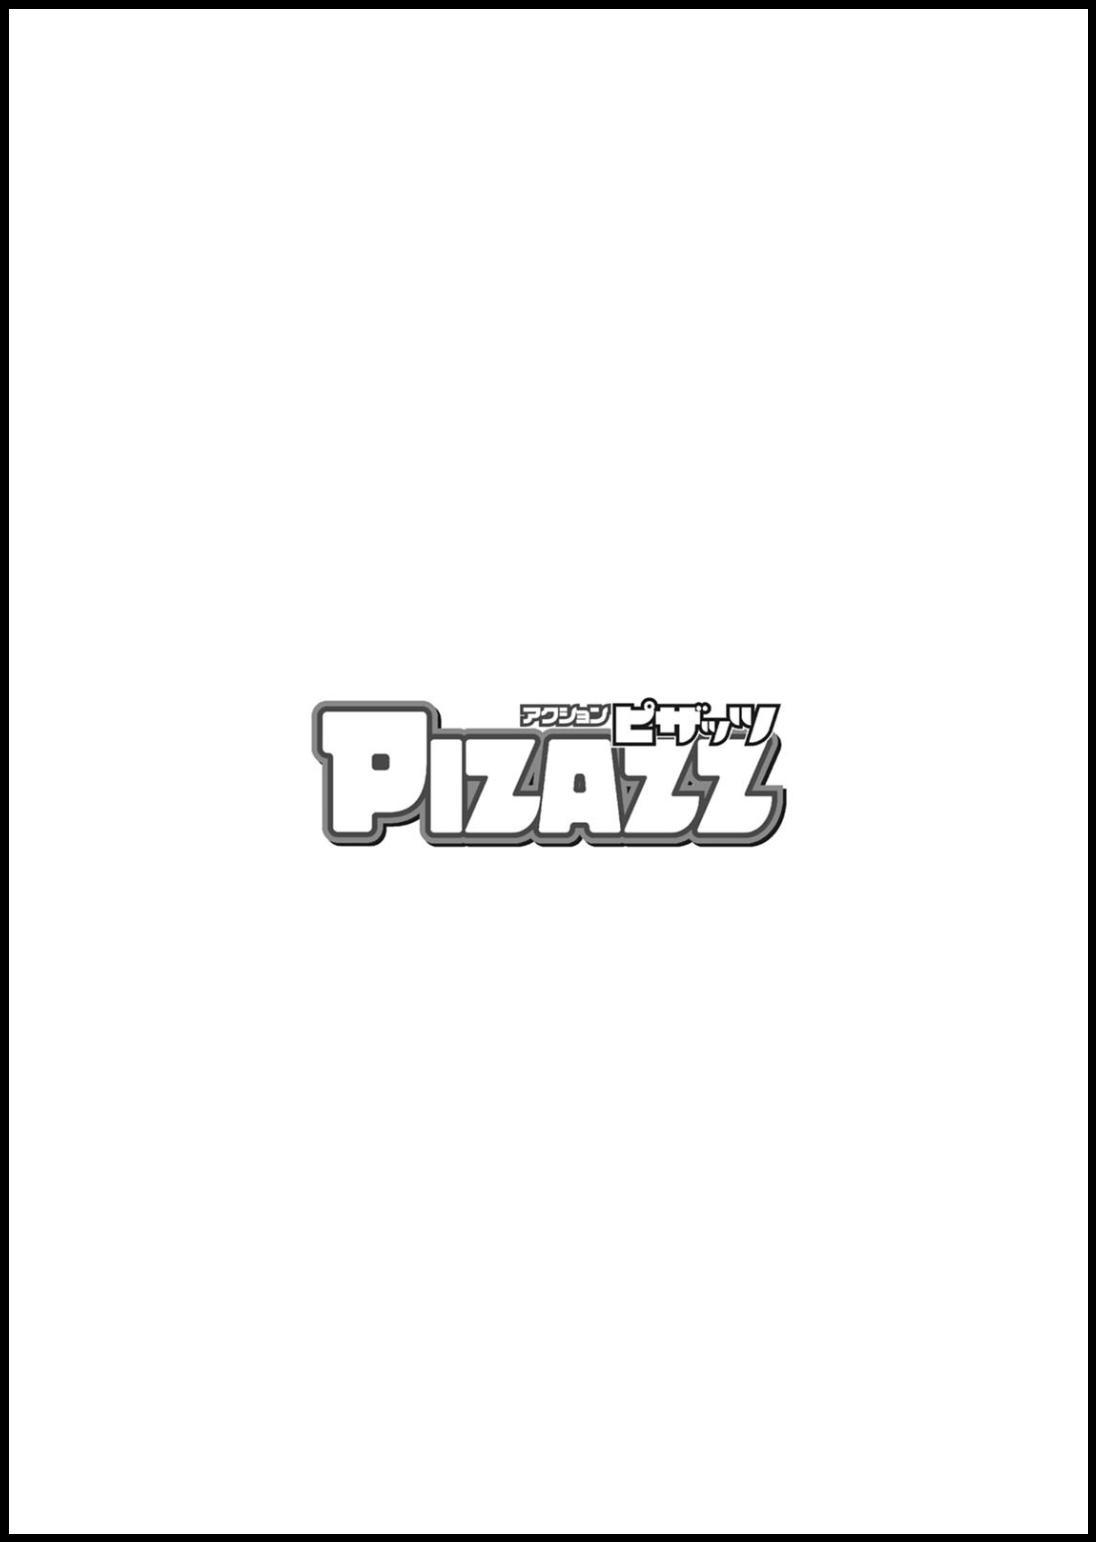 Action Pizazz 2020-05 365